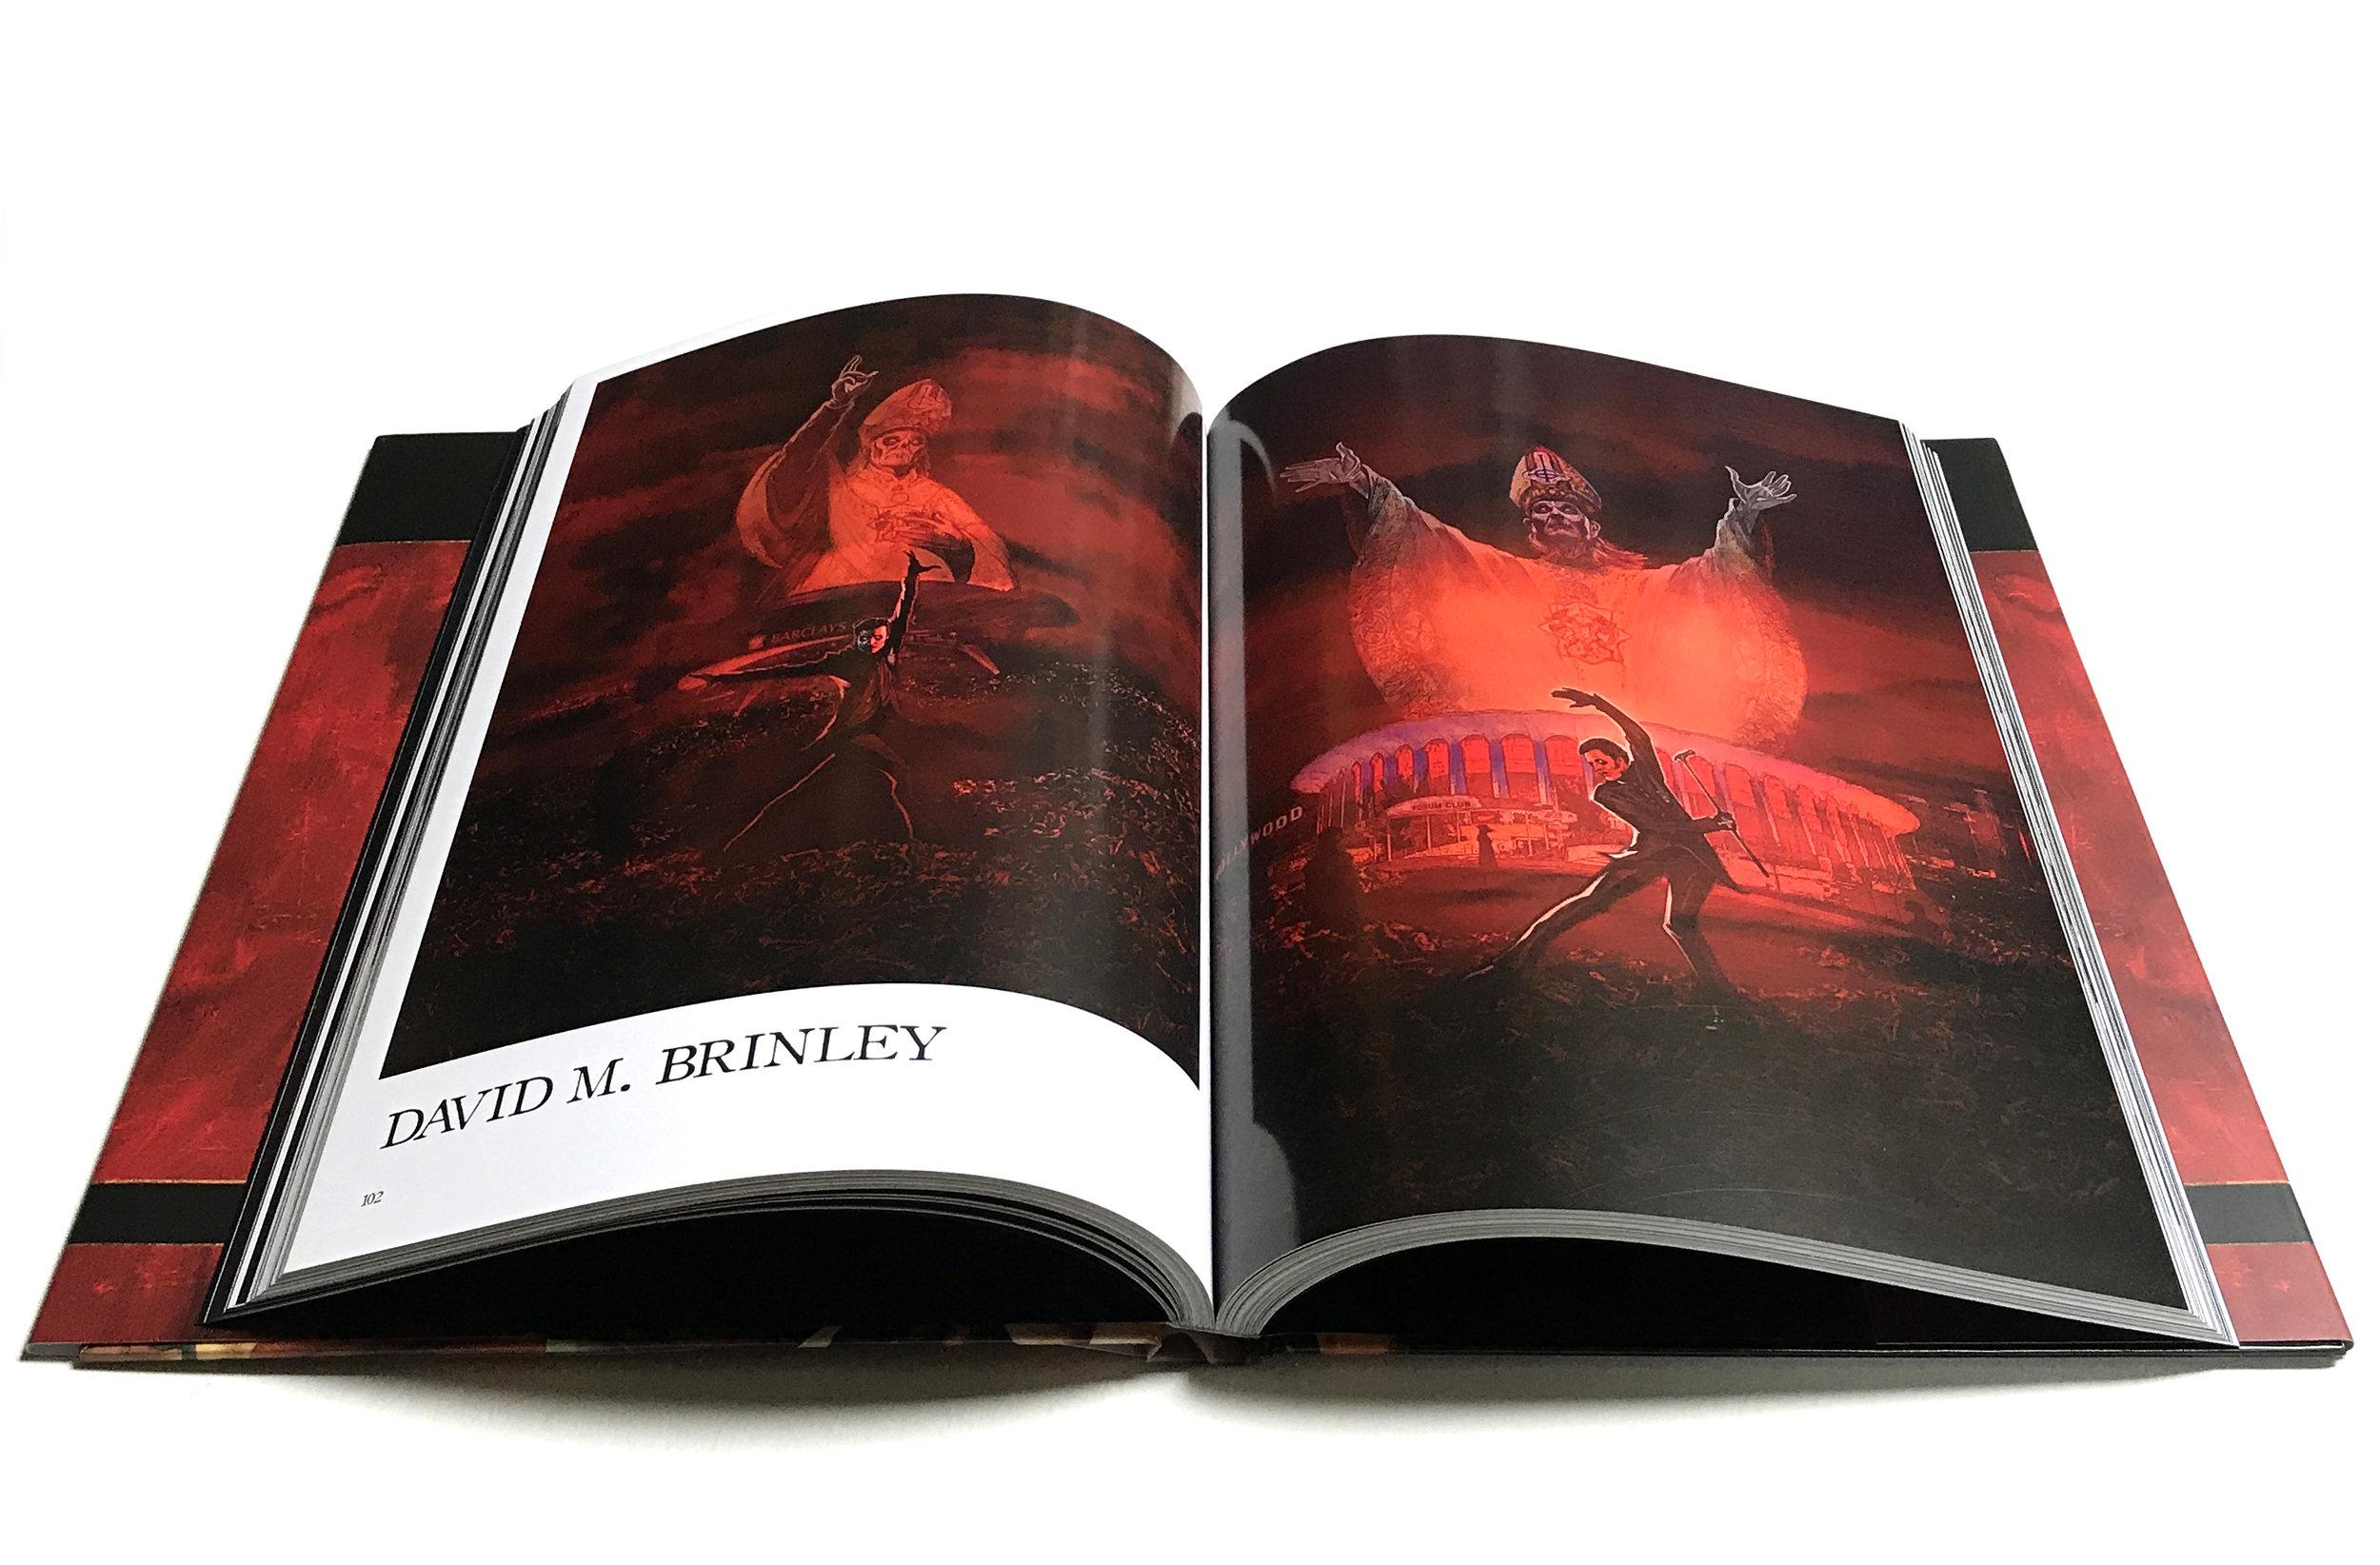 ARTE ARCANA   featuring David M. Brinley illustration    79 artists  300 Limited Editions   August 2018   Heavy Music Artwork Press